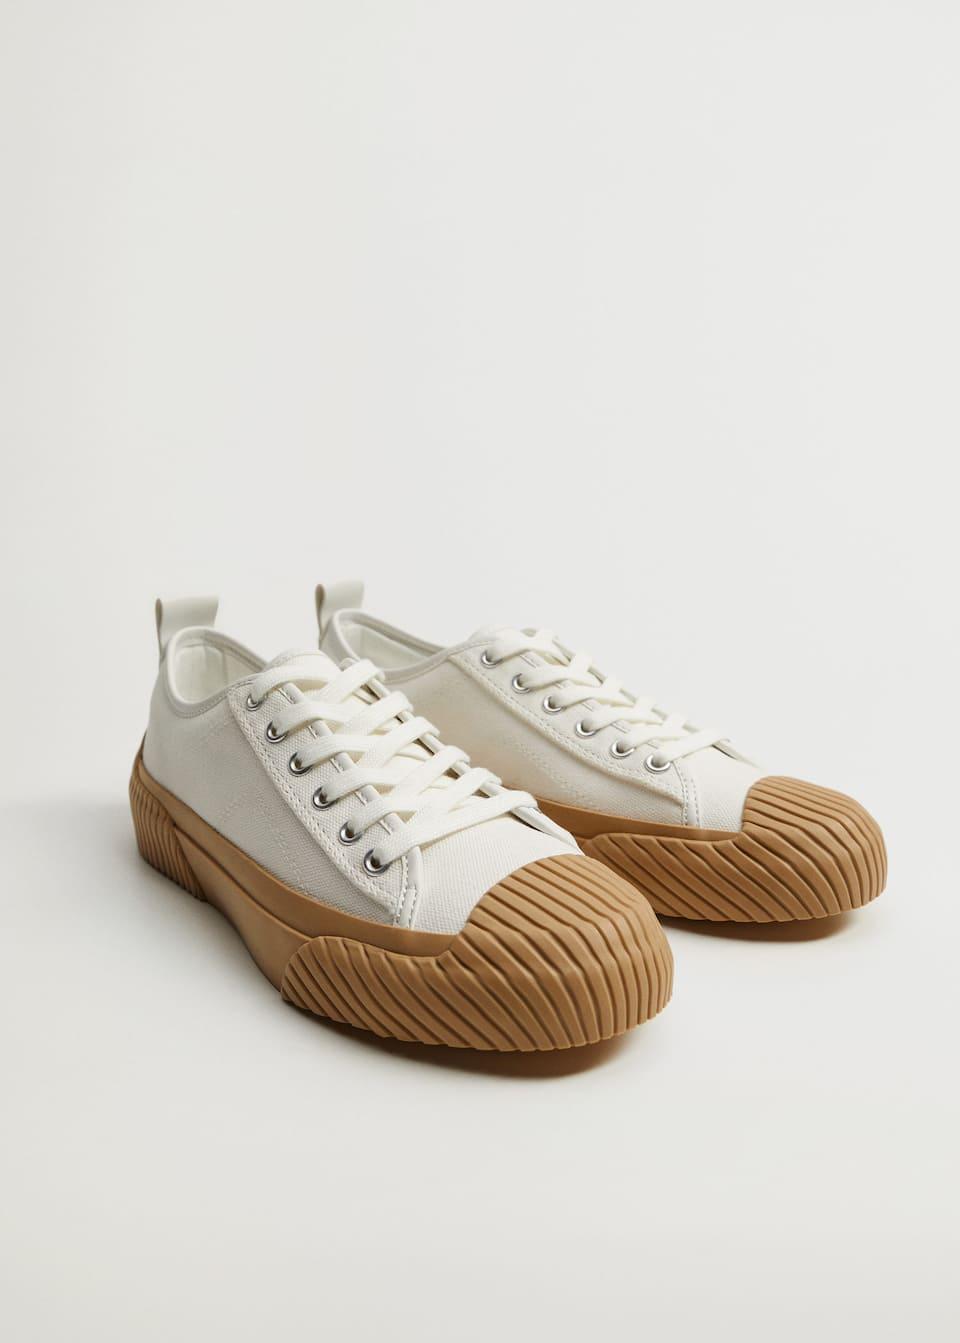 Organic cotton sneakers - Medium plane